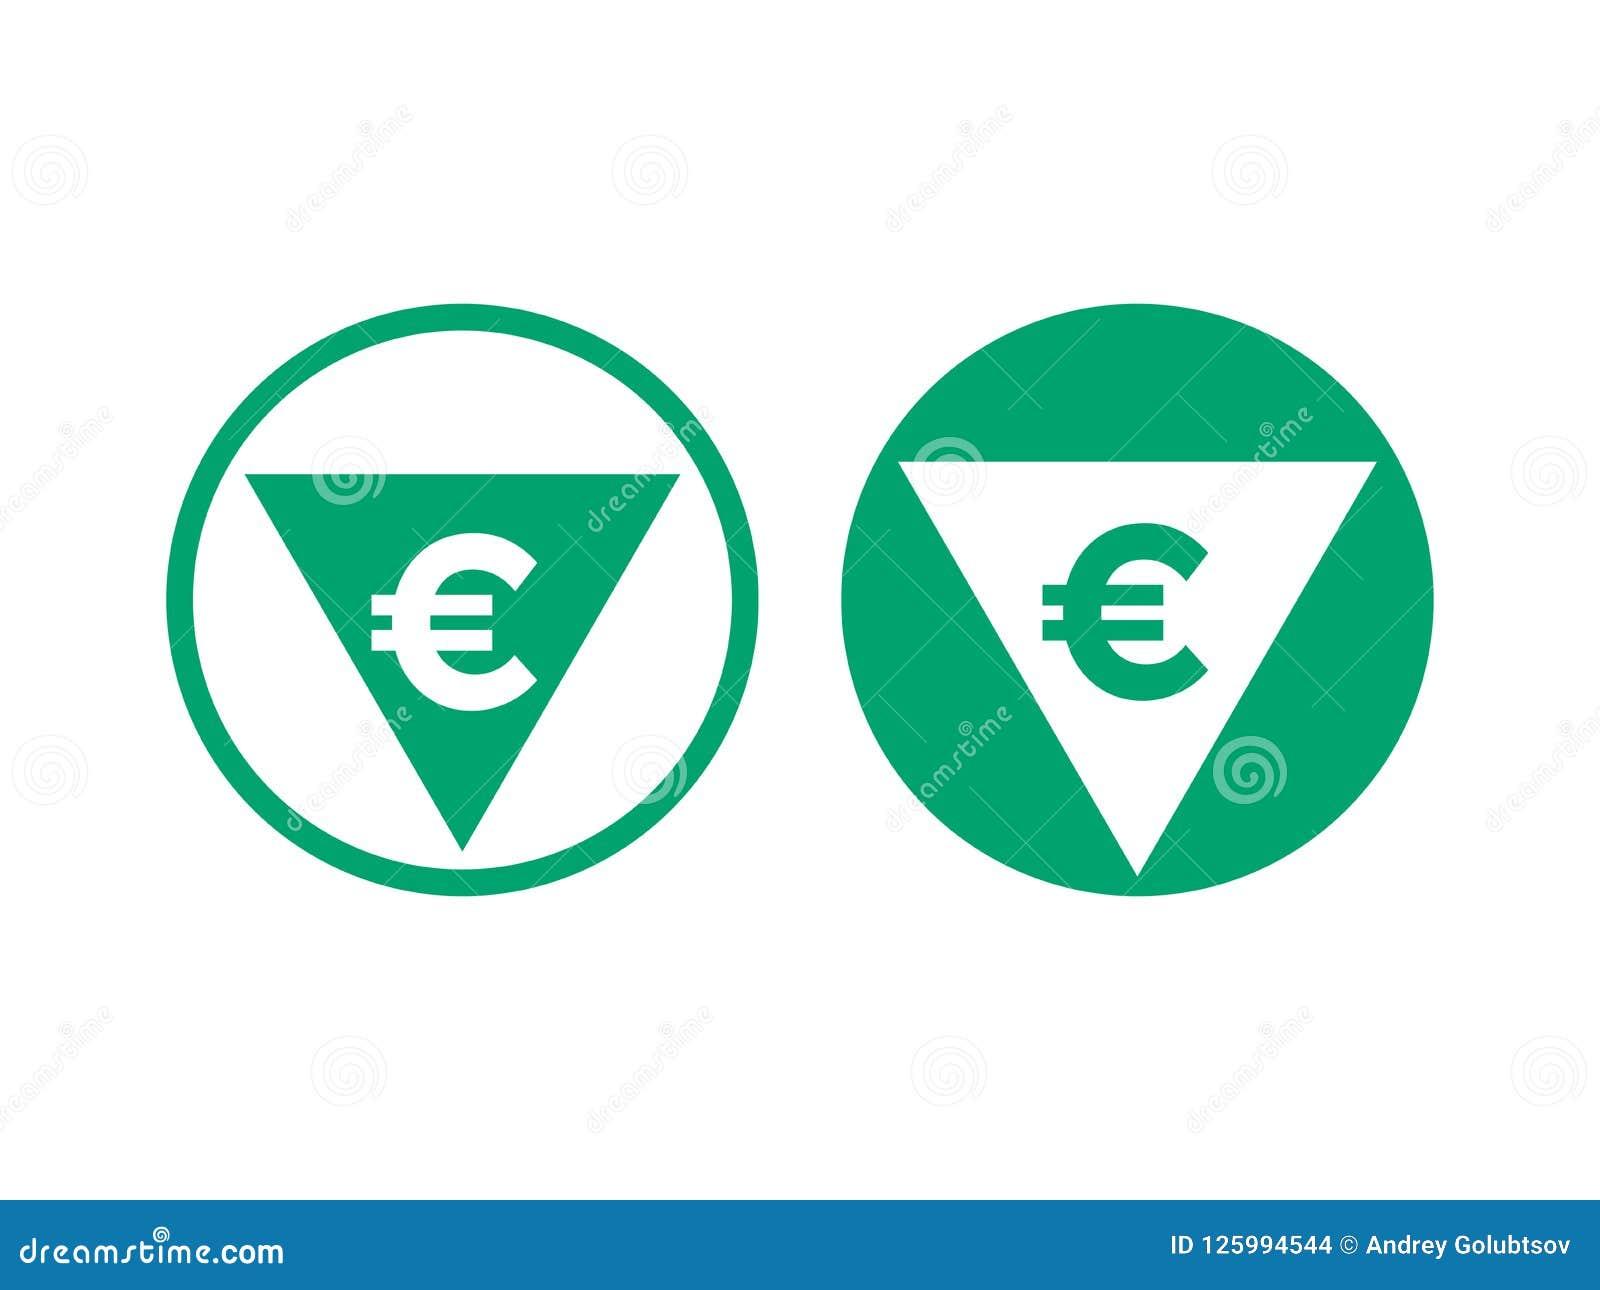 Уменшение евро себестоимоста и растет значок вектора